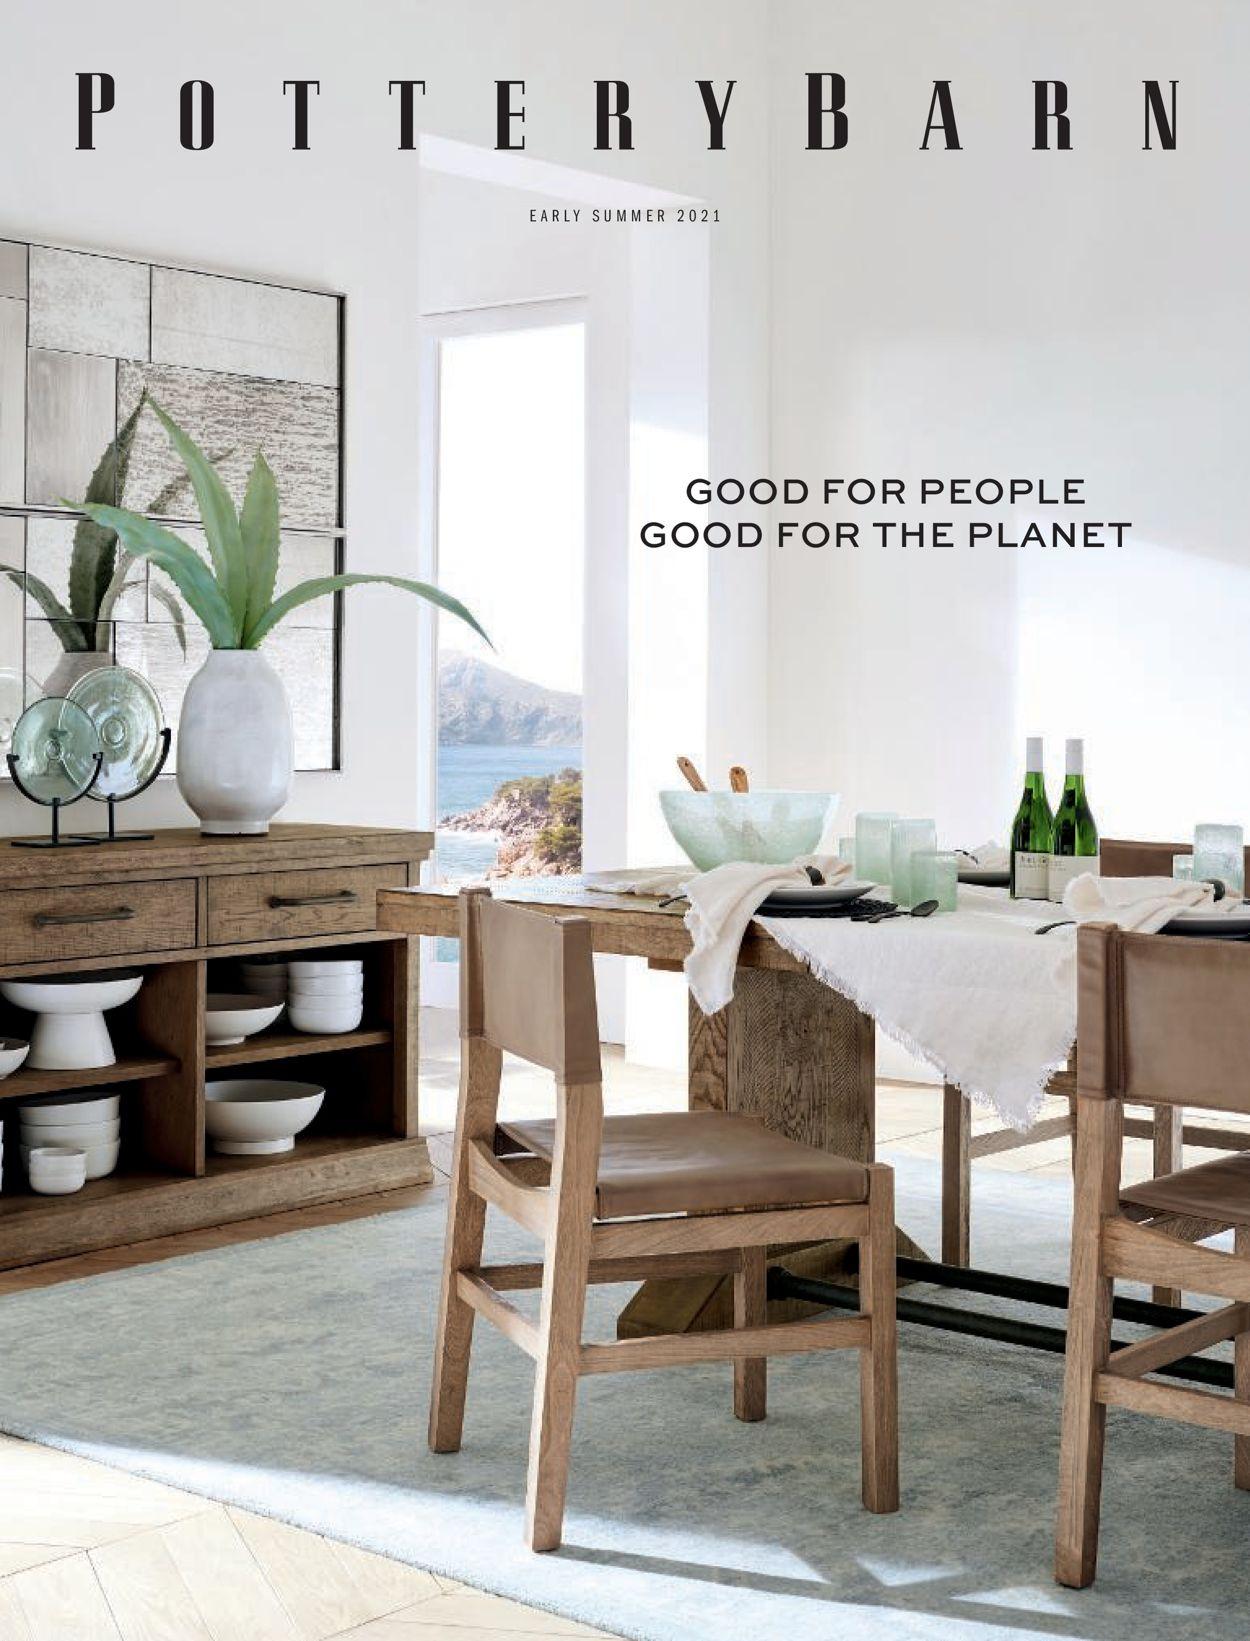 Pottery Barn weekly-ad